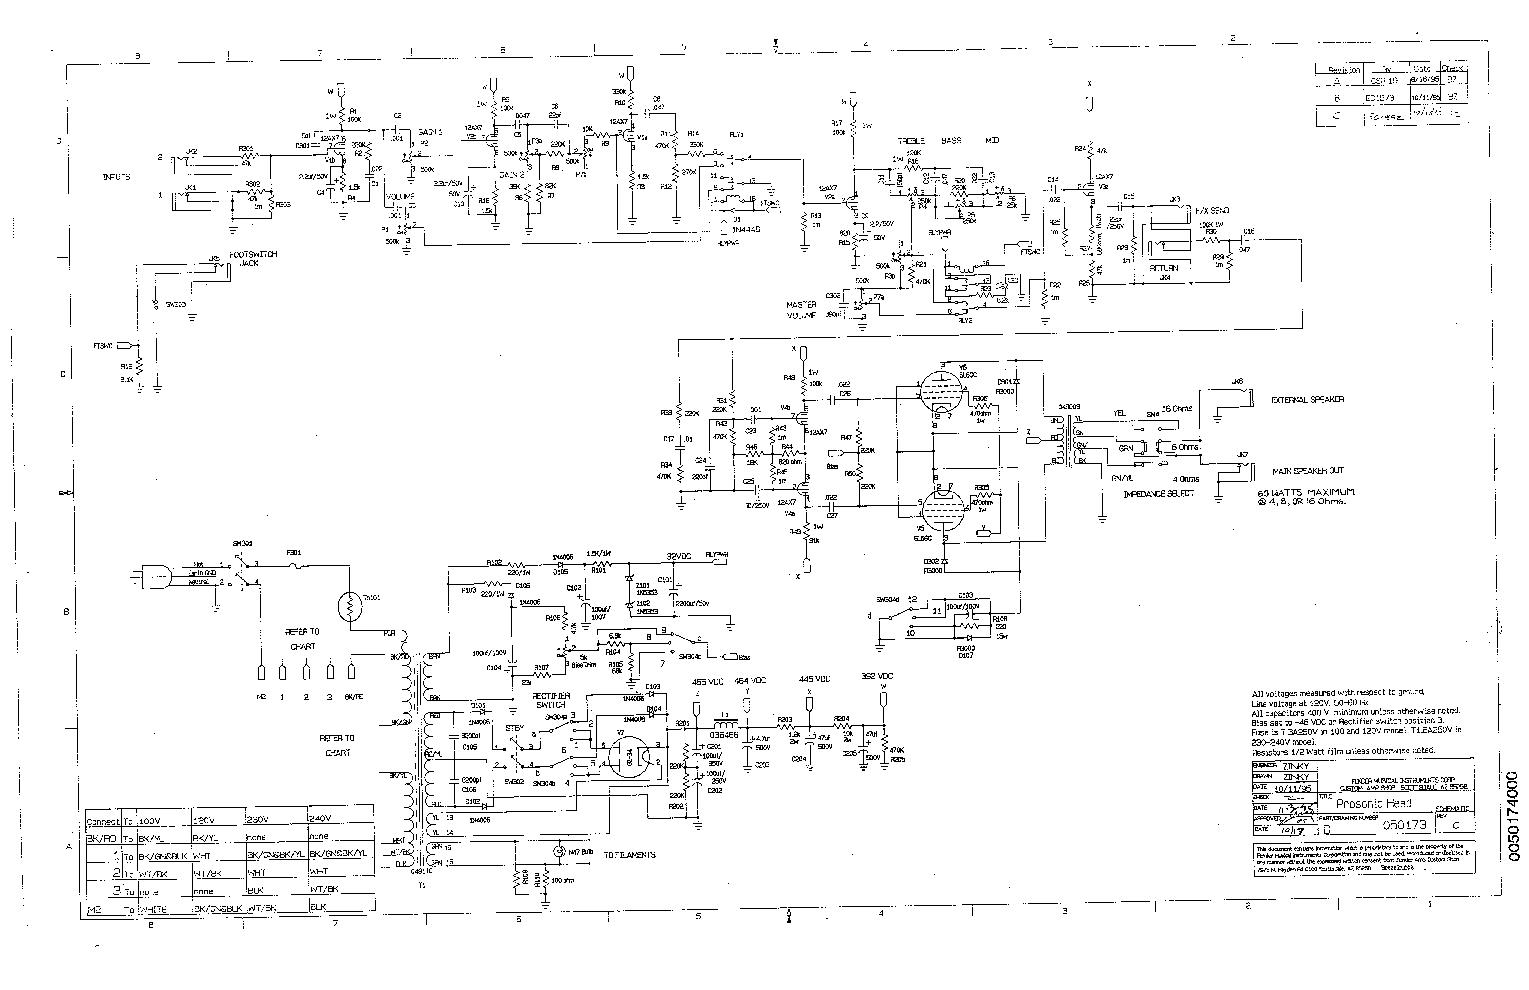 sunn 200s schematic with Zmvuzgvyihzpynjvigtpbmcgc2nozw1hdglj on Get131137 further Sunn   Schematics as well Sunn 2000s Schematic besides Music Related Question On Gt 5751m furthermore 1236863.